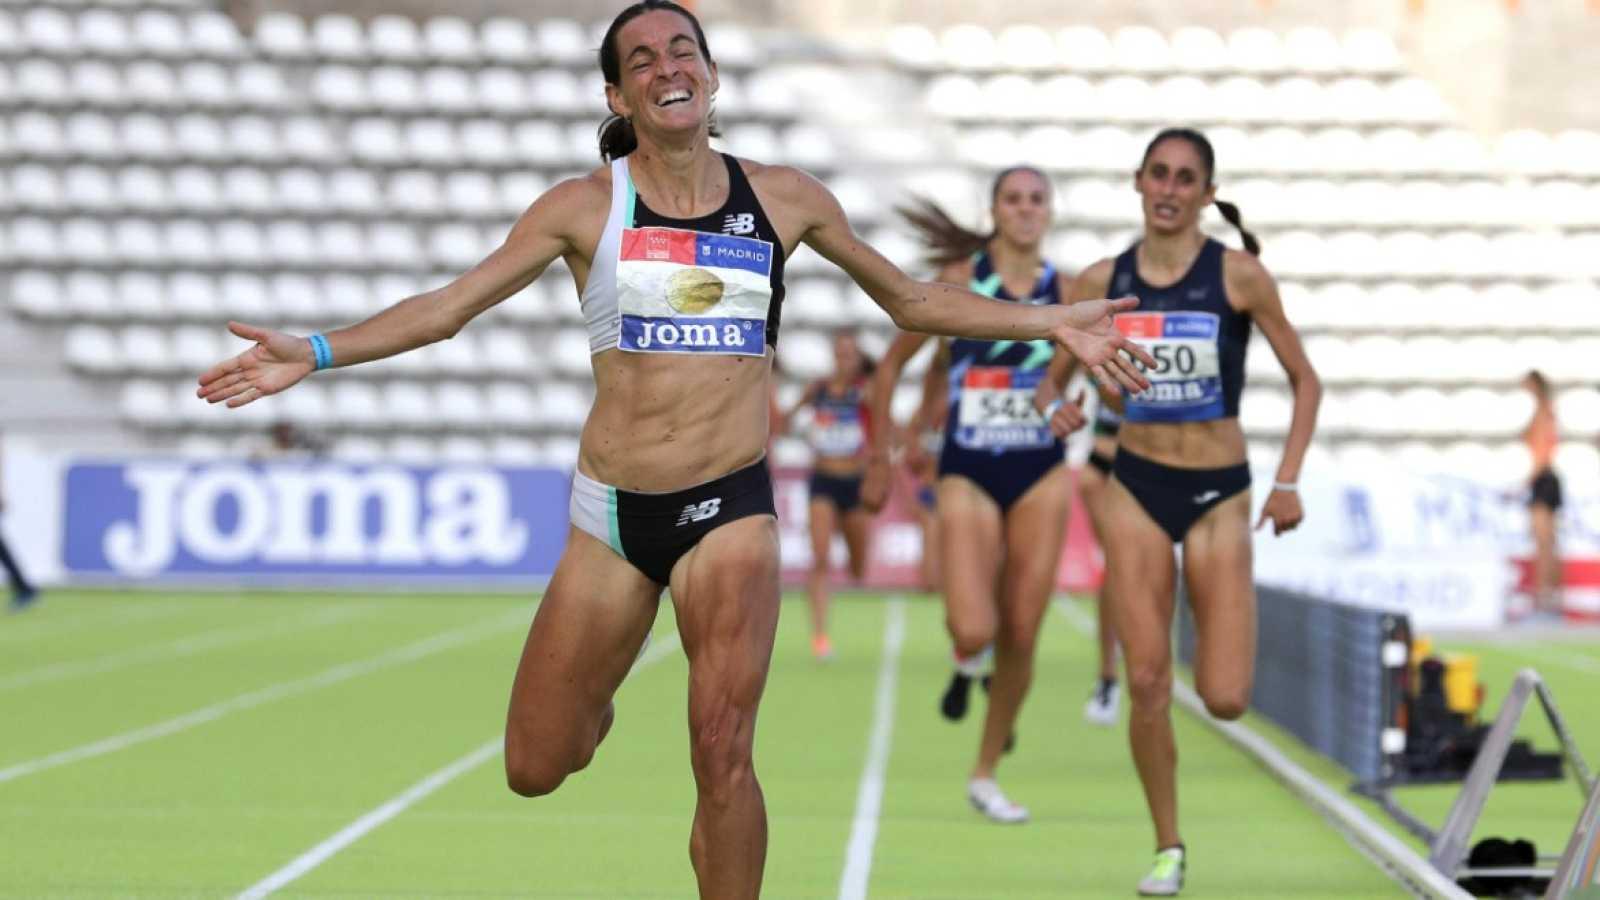 Esther Guerero logra un doblete histórico tras proclamarse campeona de España de 1.500m